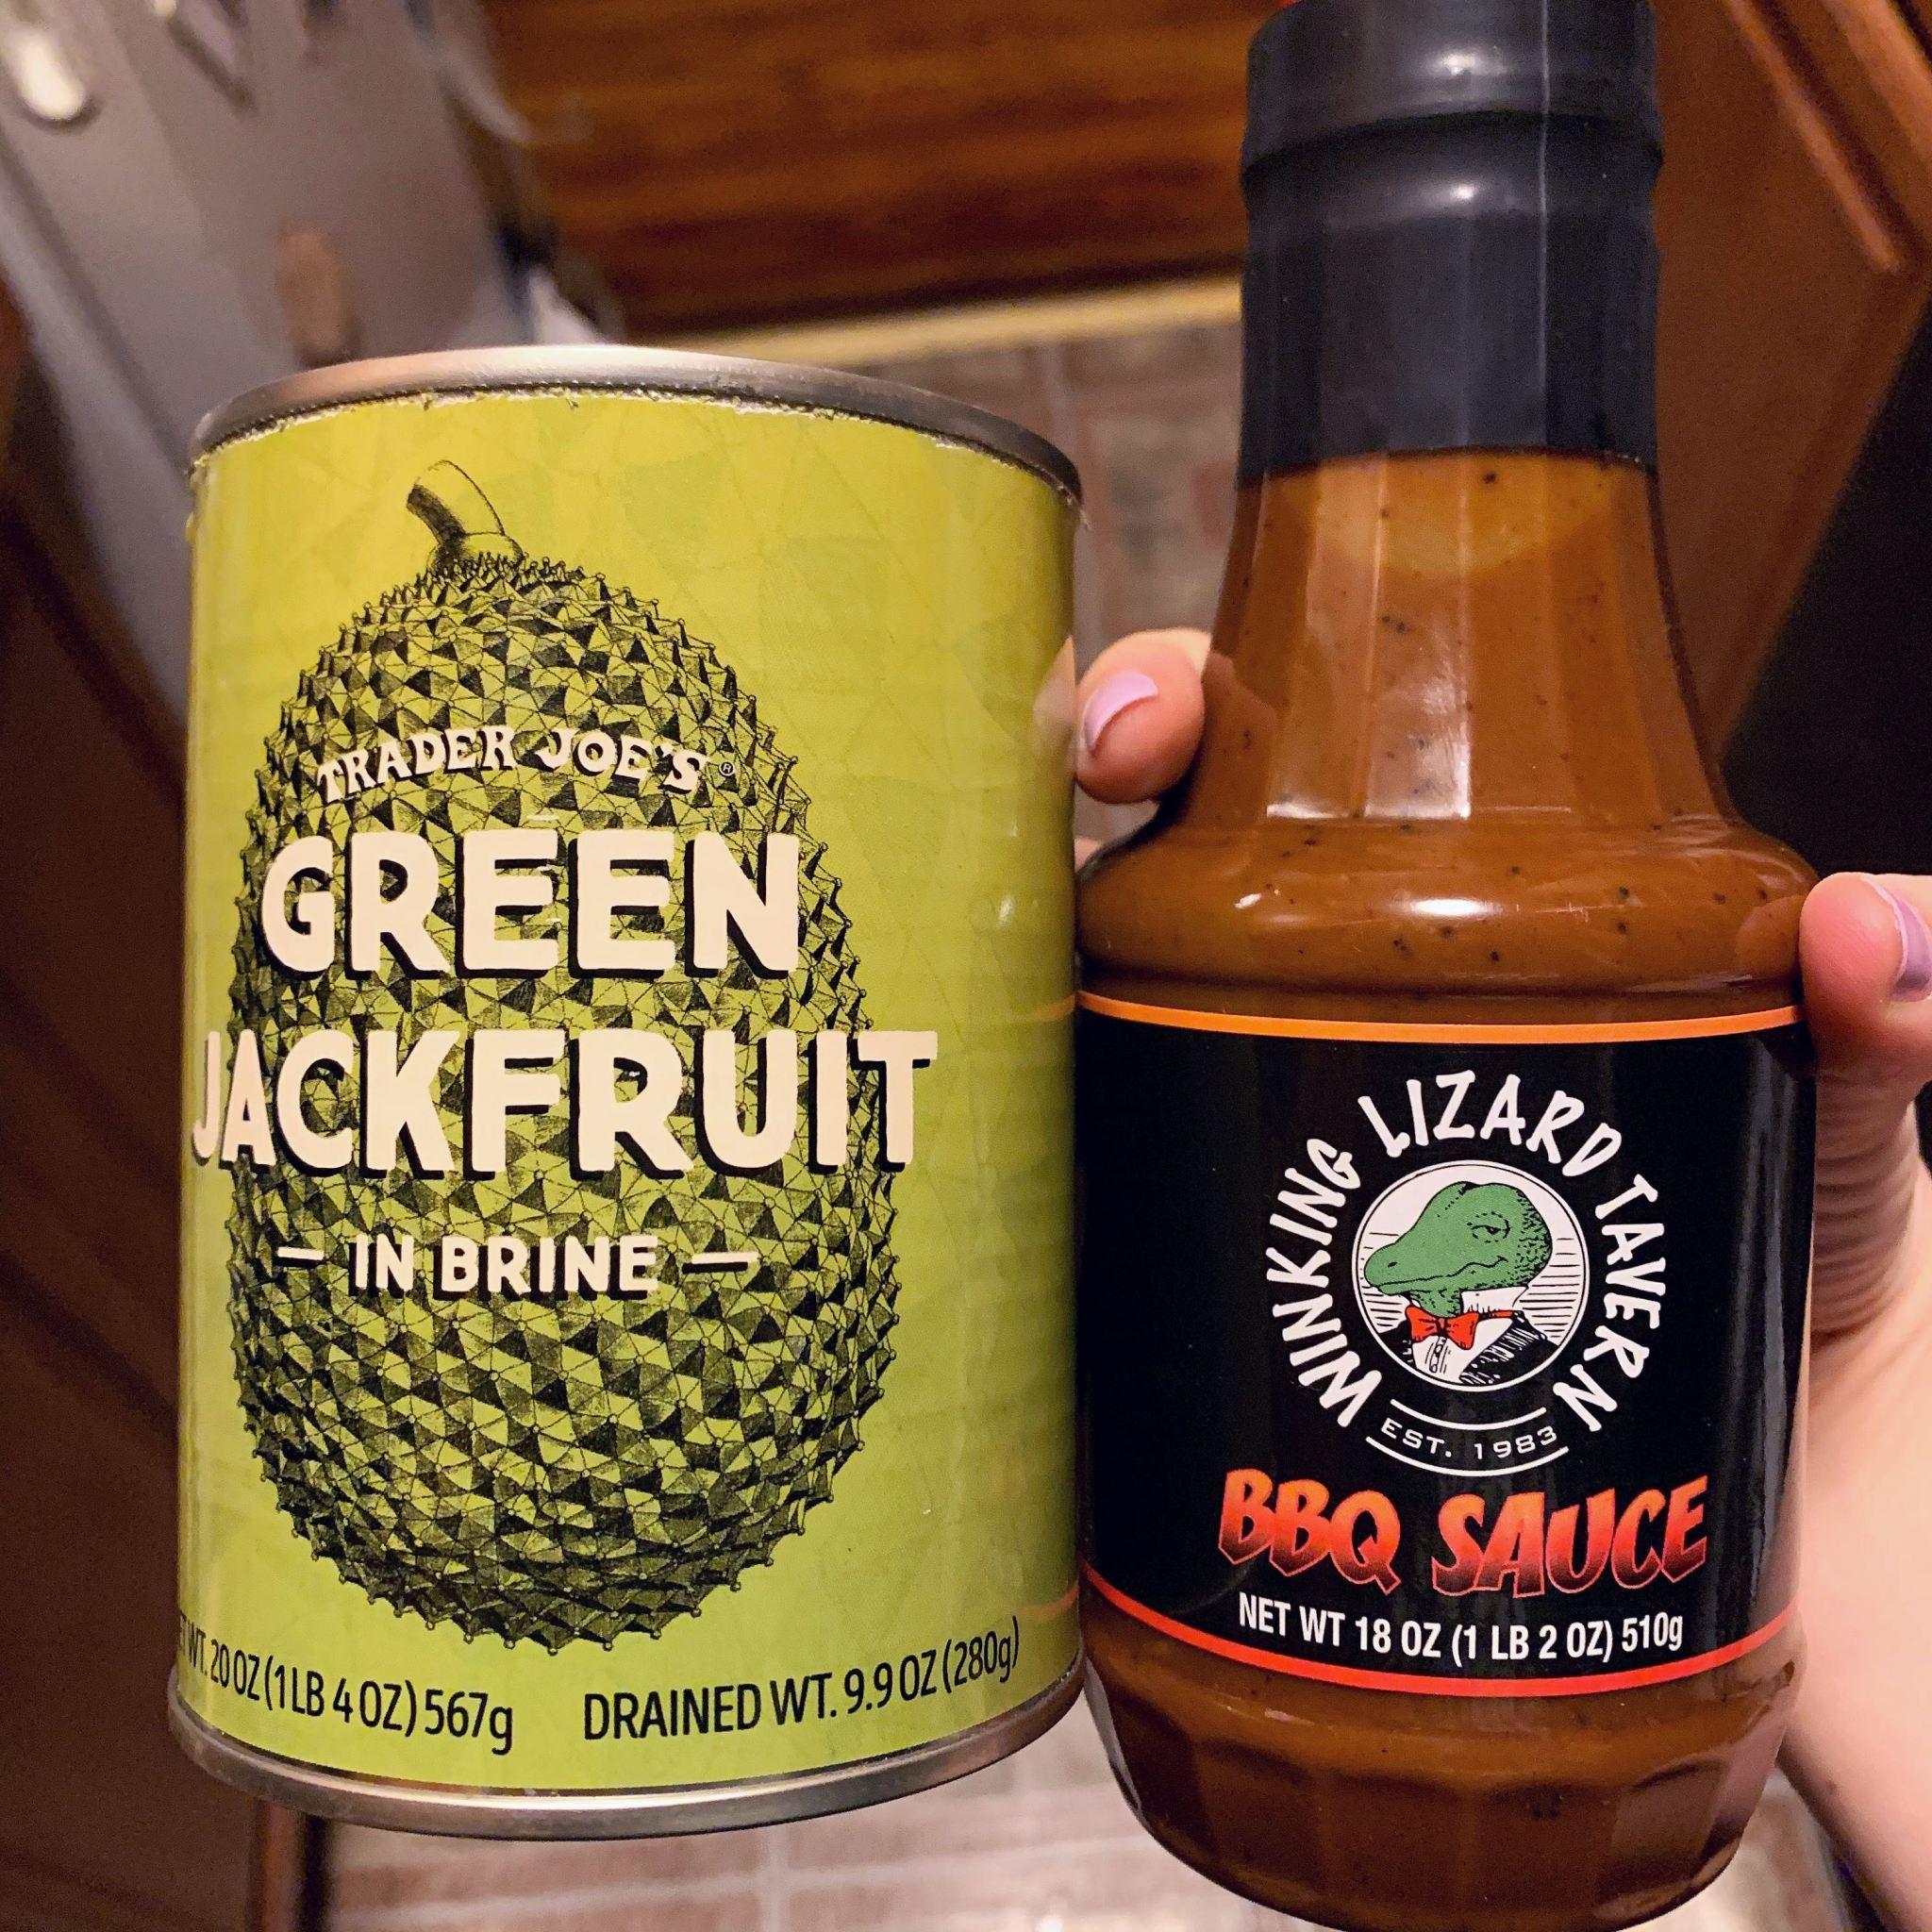 Canned Green Jackfruit and Winking Lizard Tavern BBQ Sauce bottle